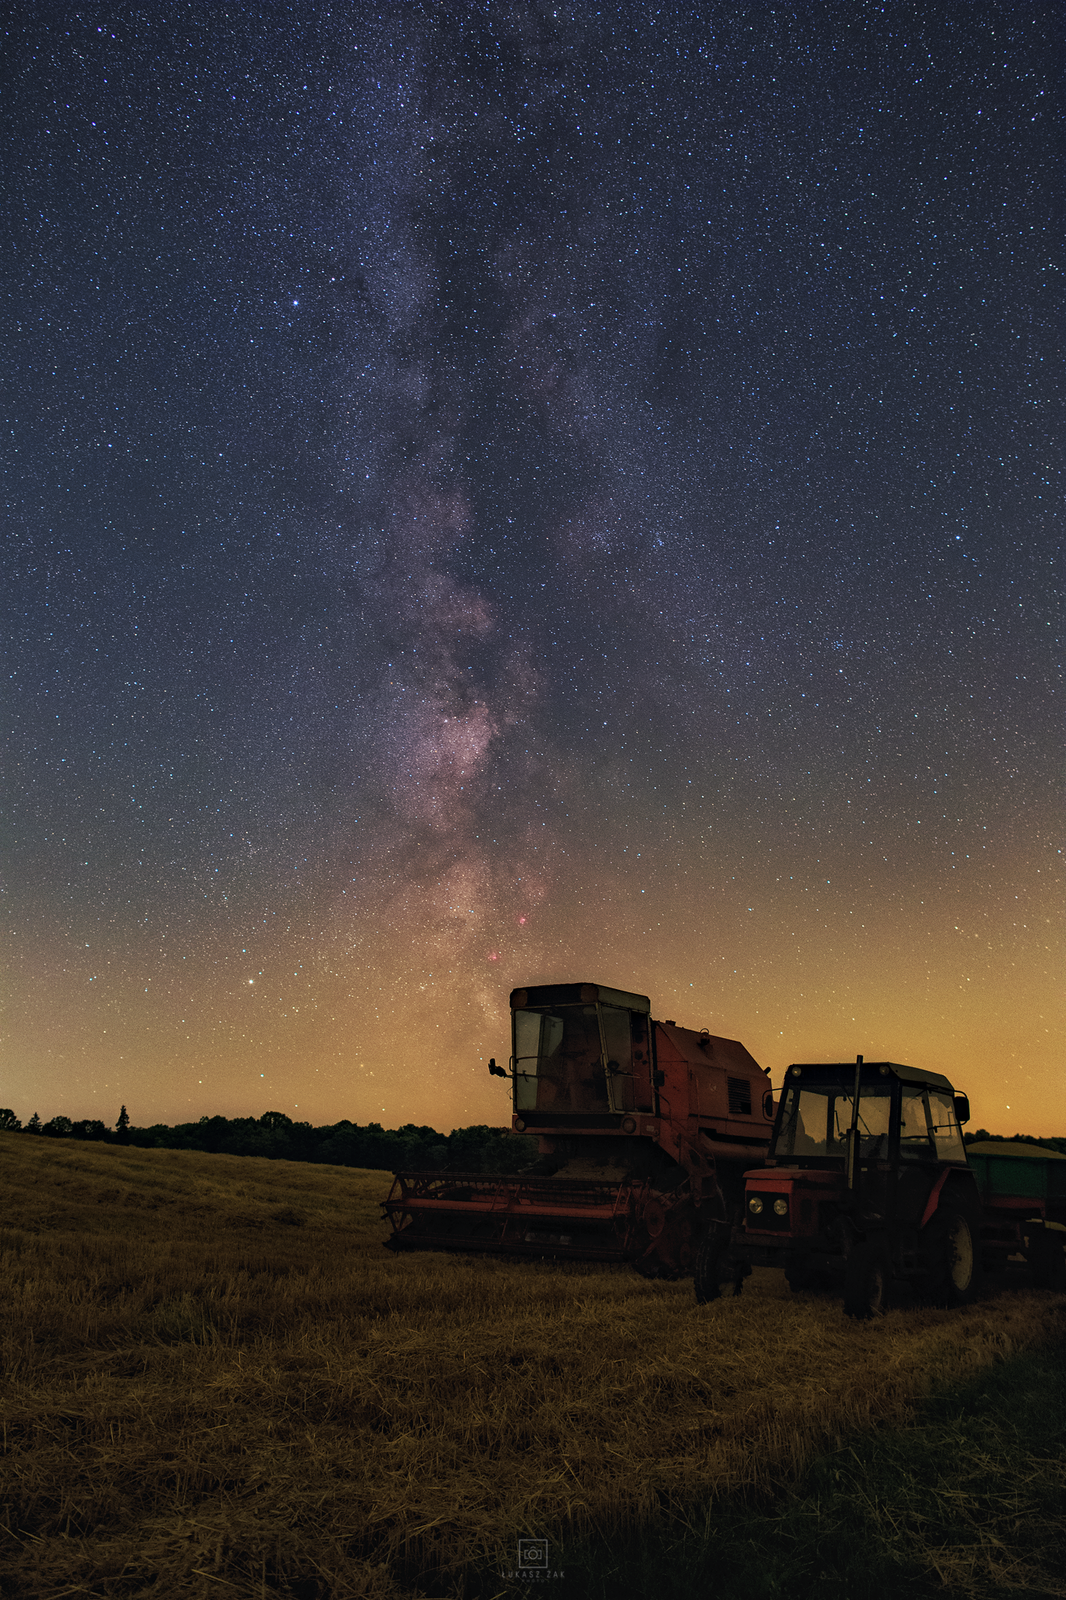 Góra_Puławska_Milky_Way_04_08_2019.png